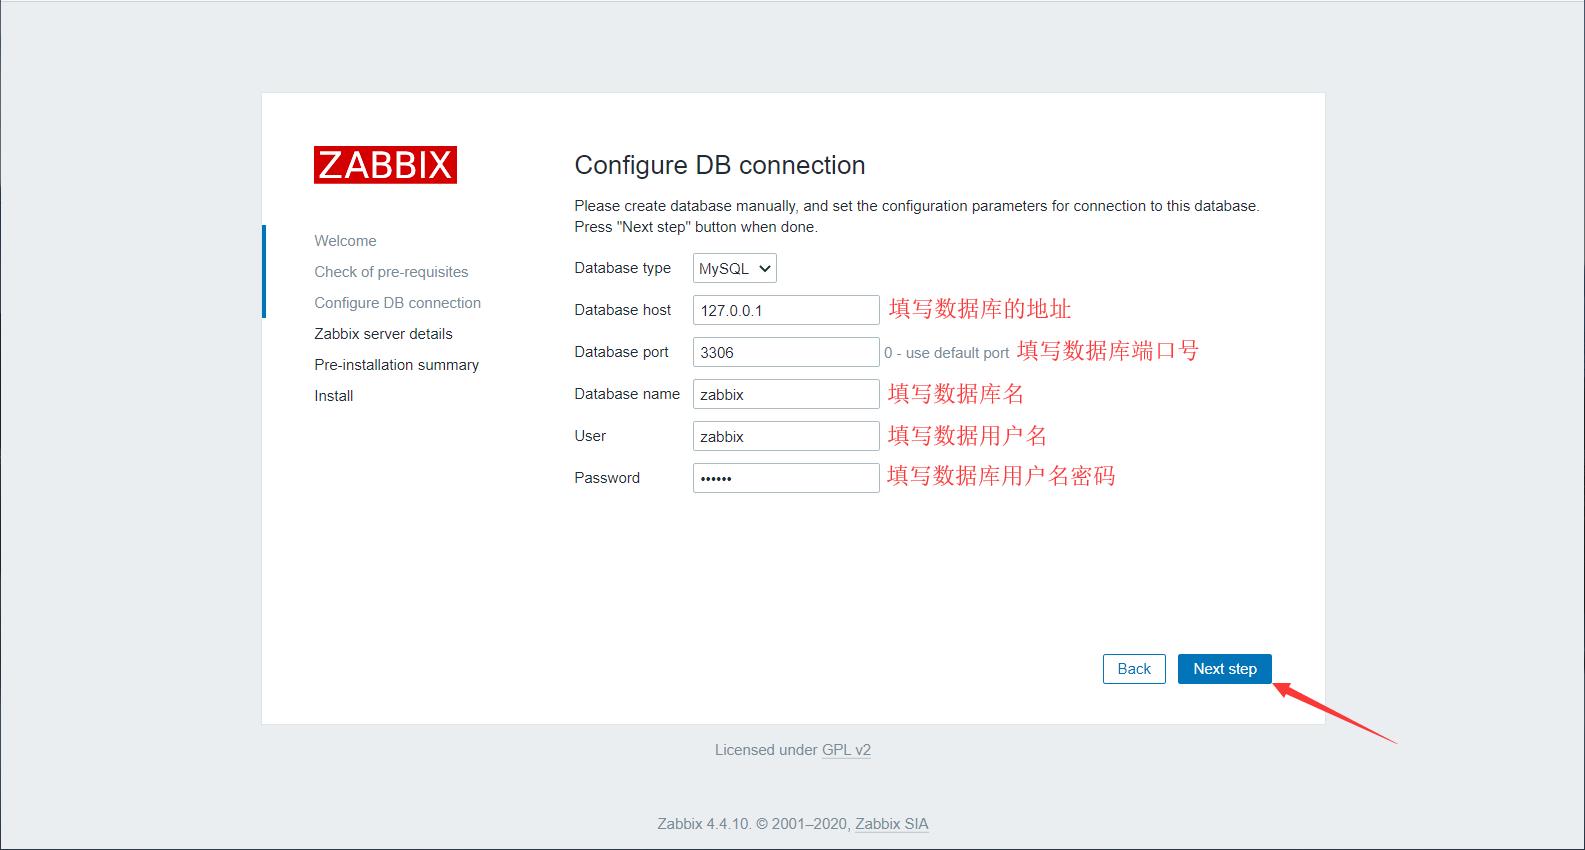 zabbix_install-3.png